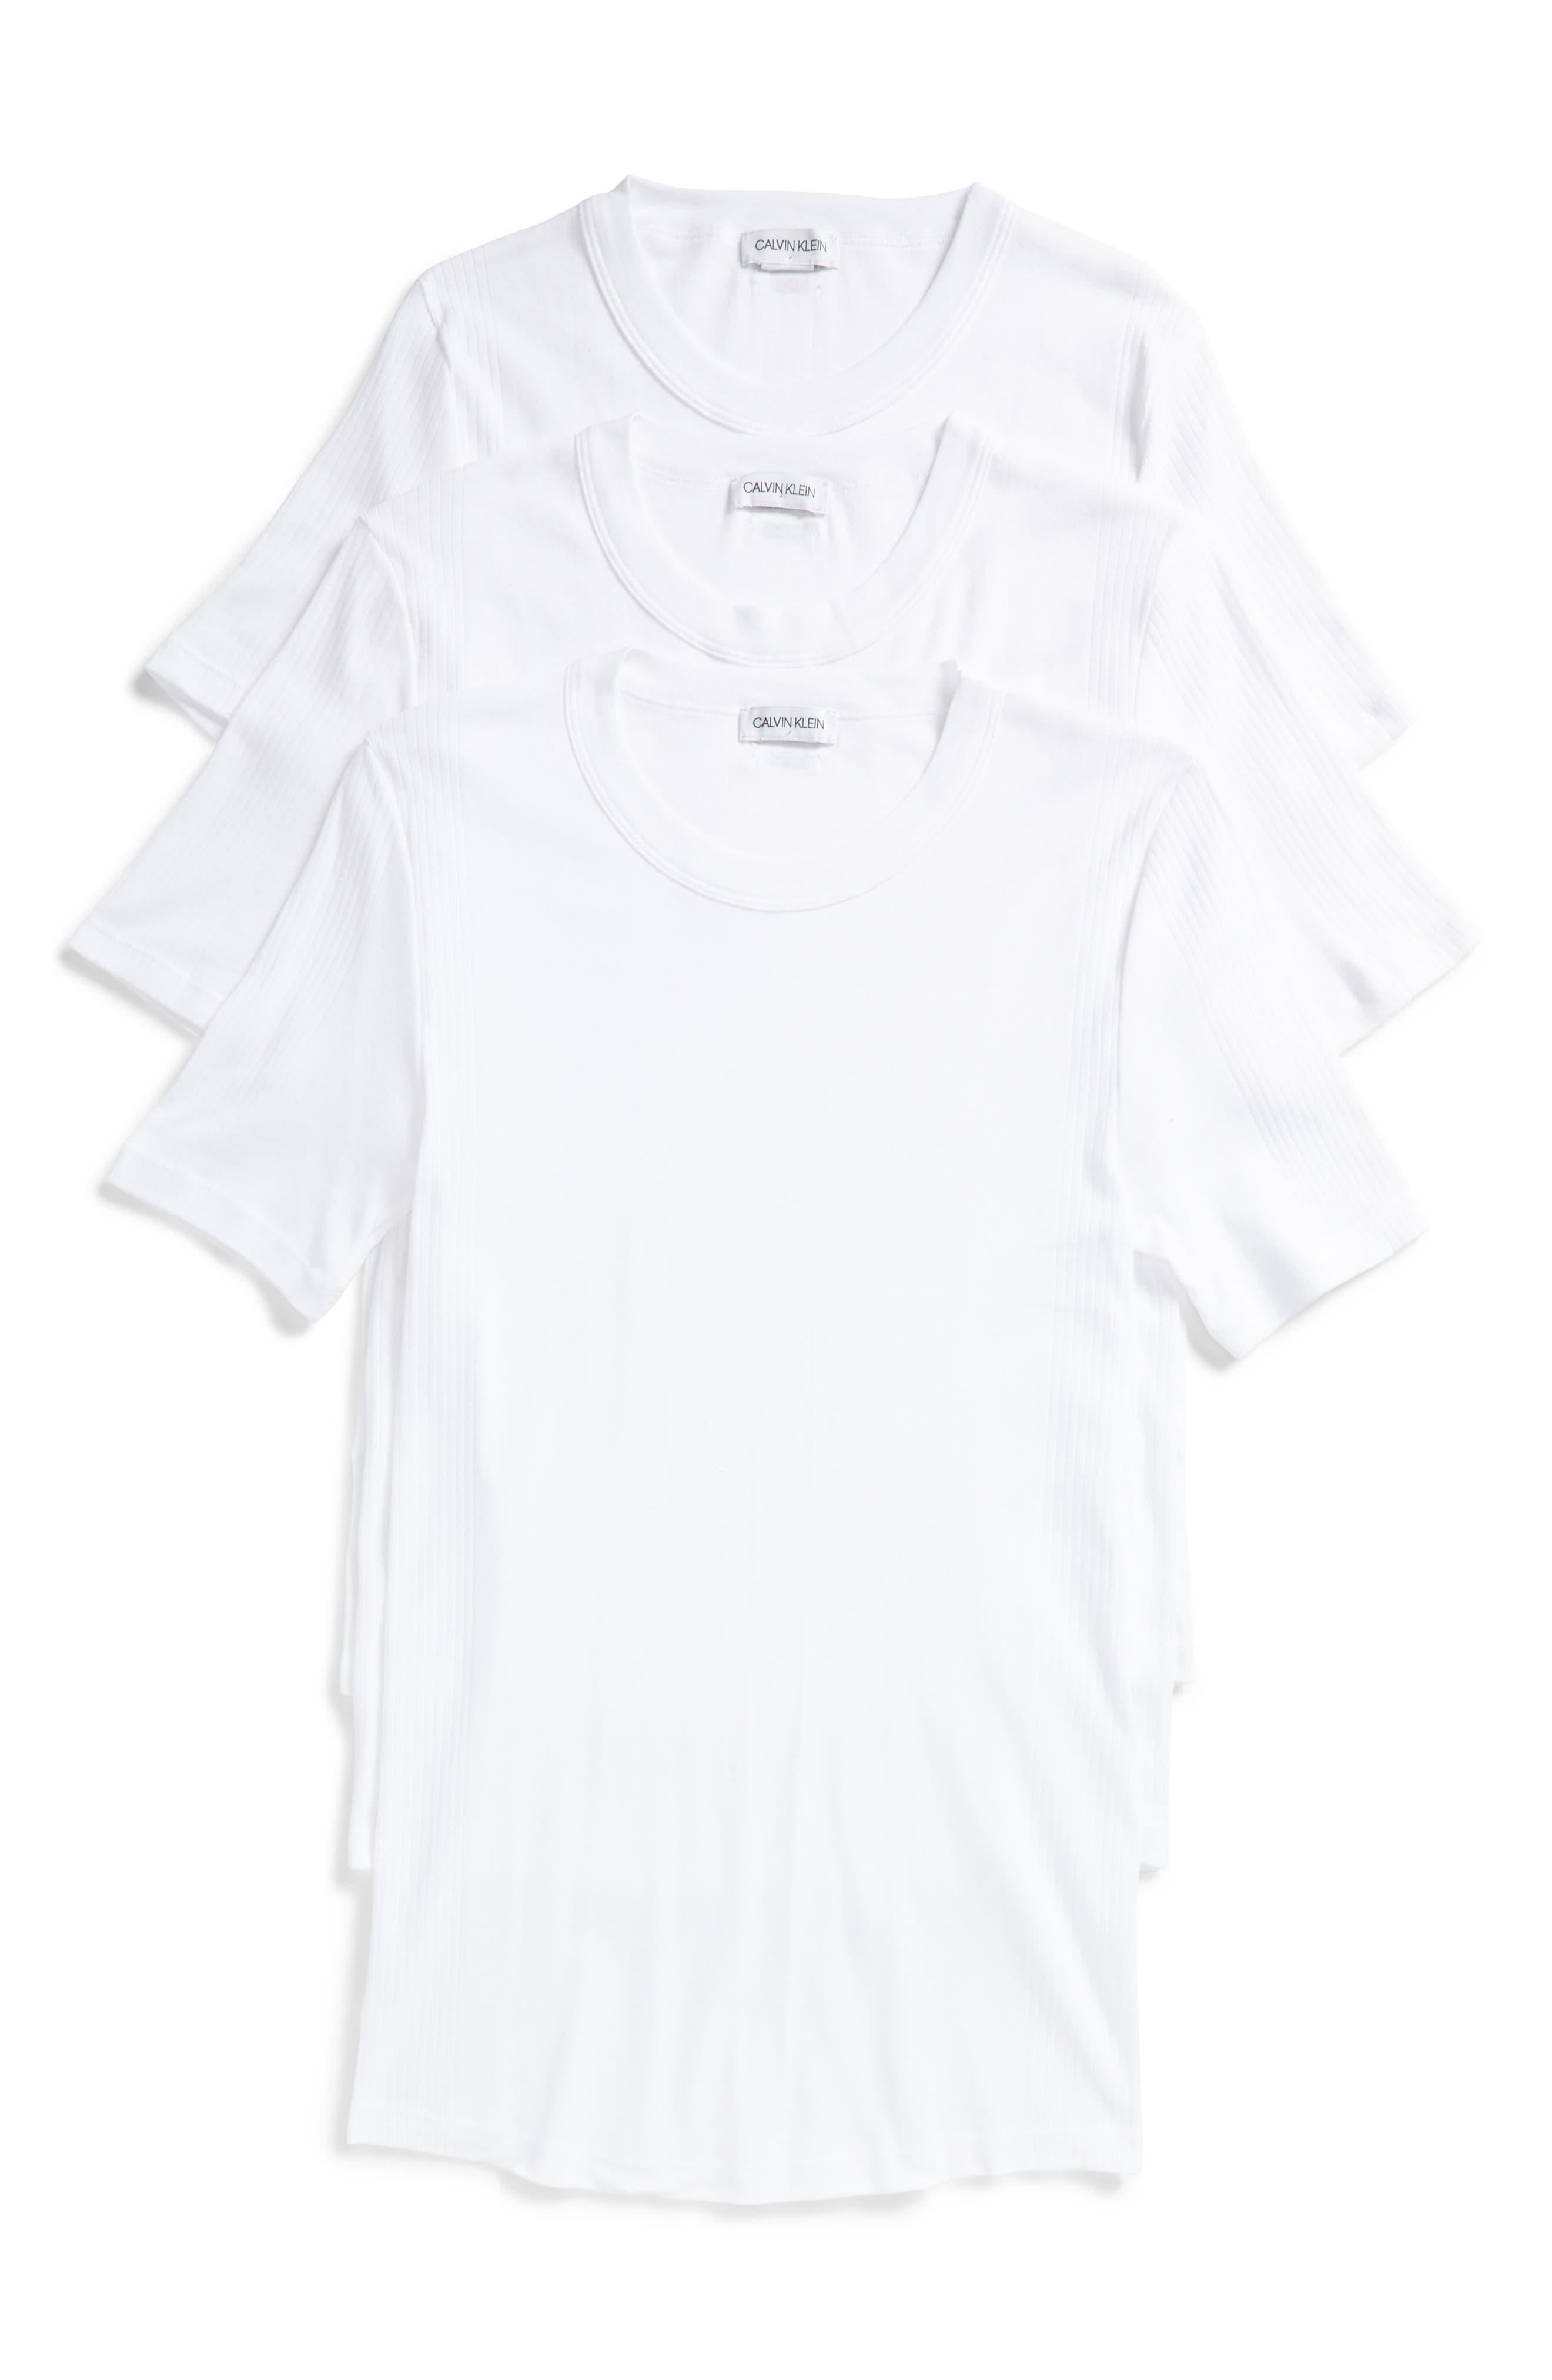 Calvin Klein 205W39NYC Concept Luxury 3-Pack Crewneck T-Shirt